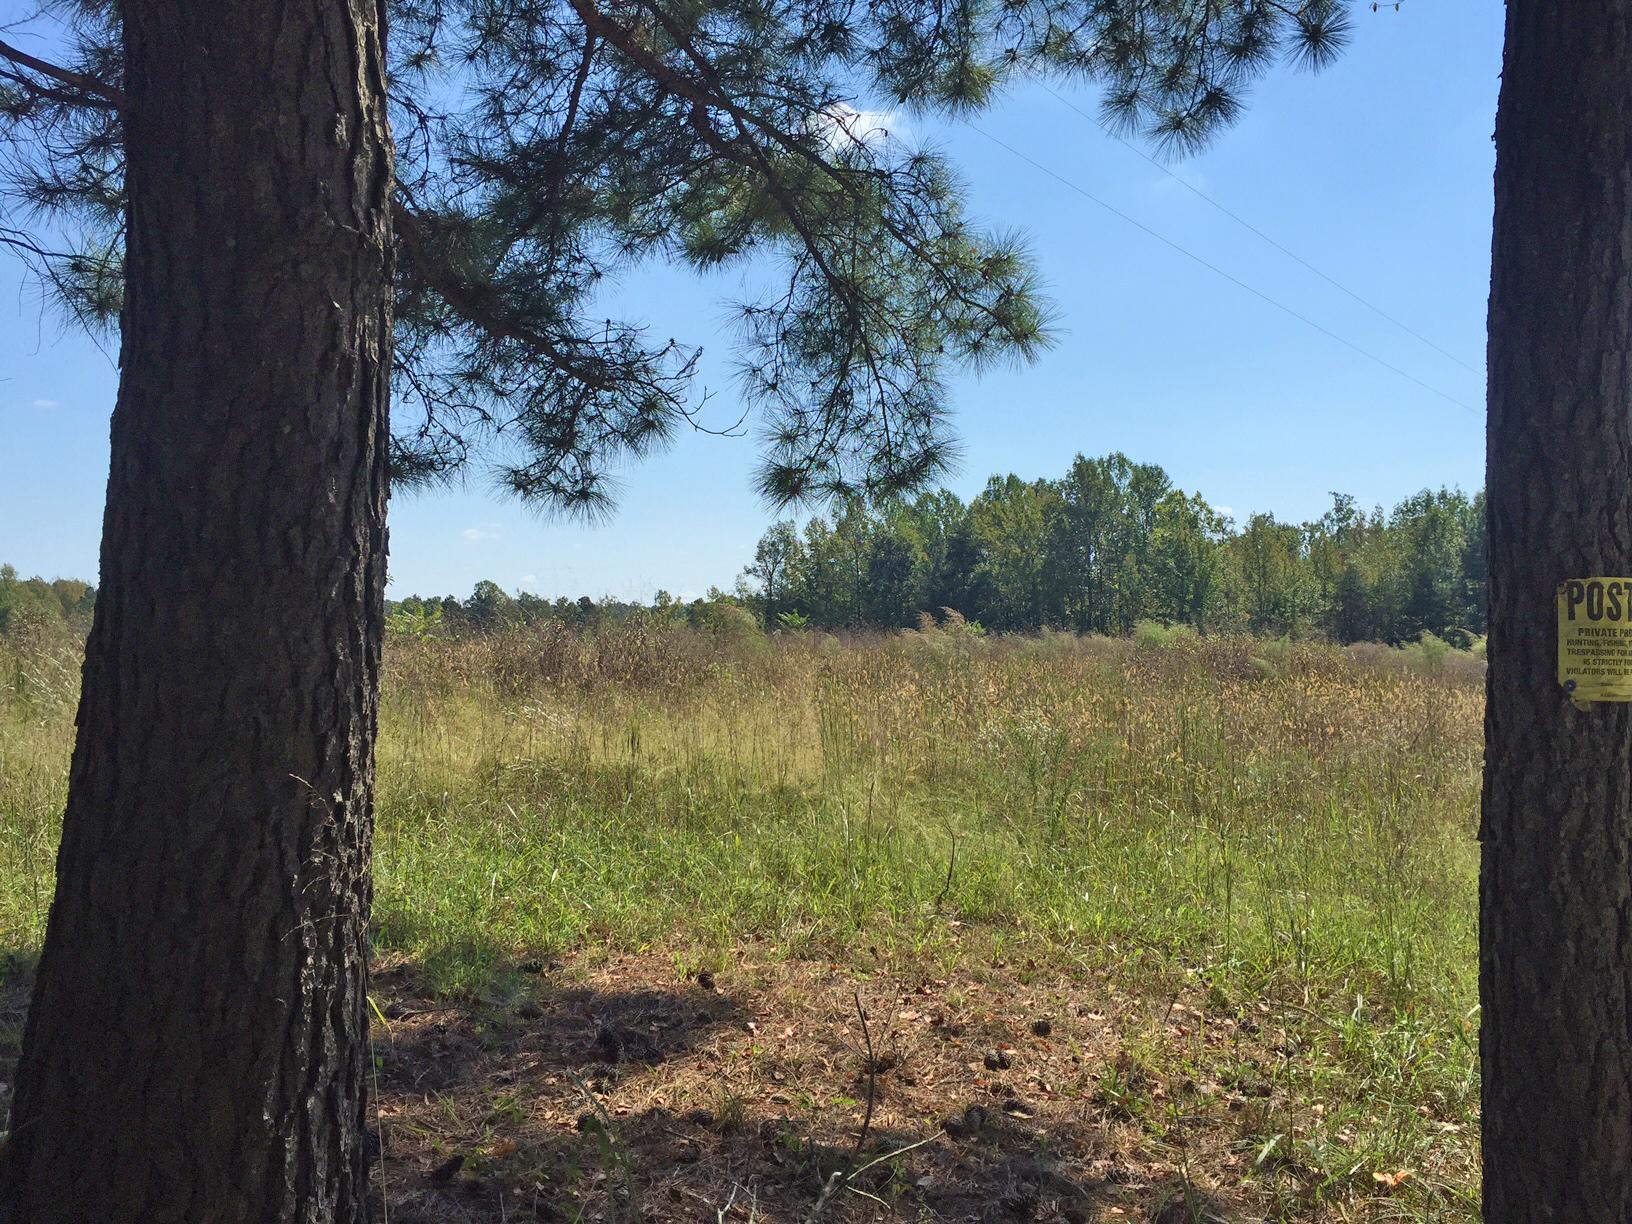 Land for Sale in Meherrin, VA – Mountain Creek Rd